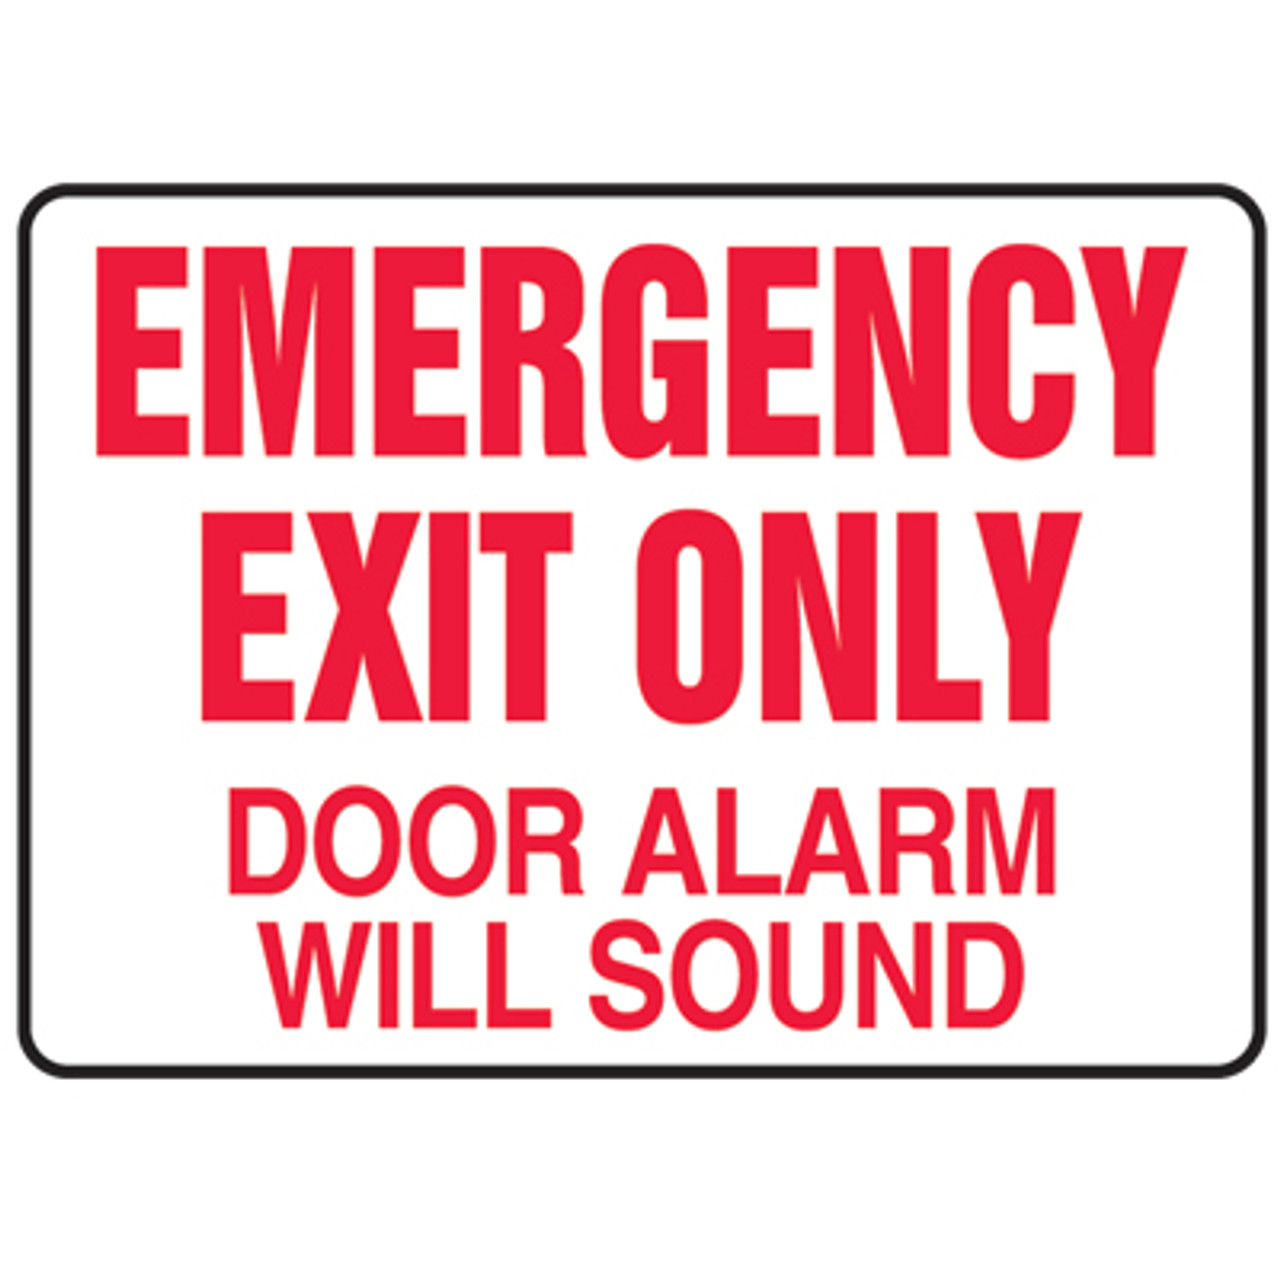 Emergency Exit Only Door Alarm Will Sound Sign